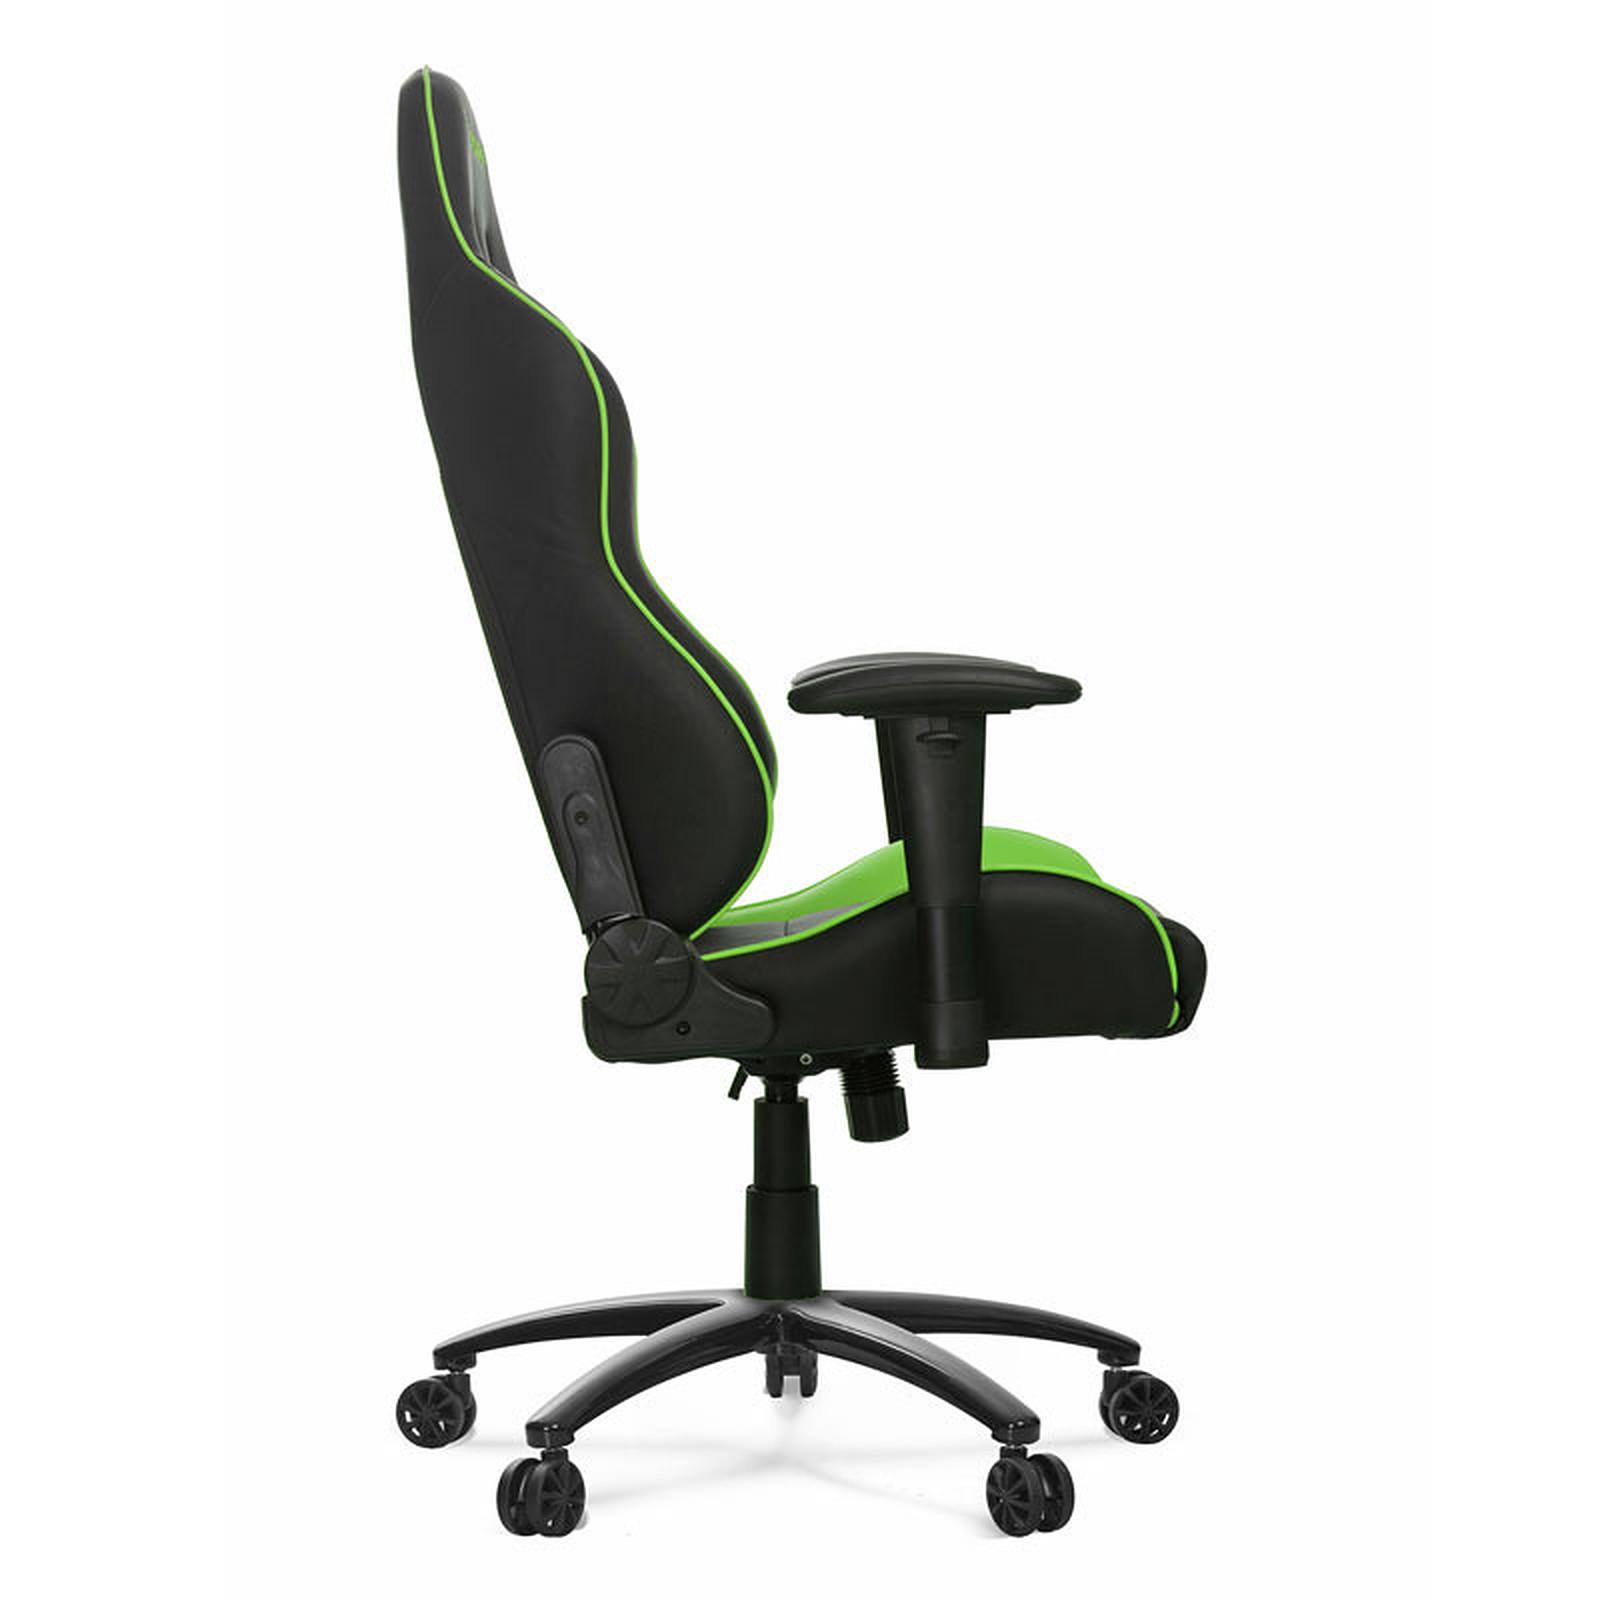 Akracing Nitro Gaming Chair Vert Fauteuil Gamer Akracing Sur